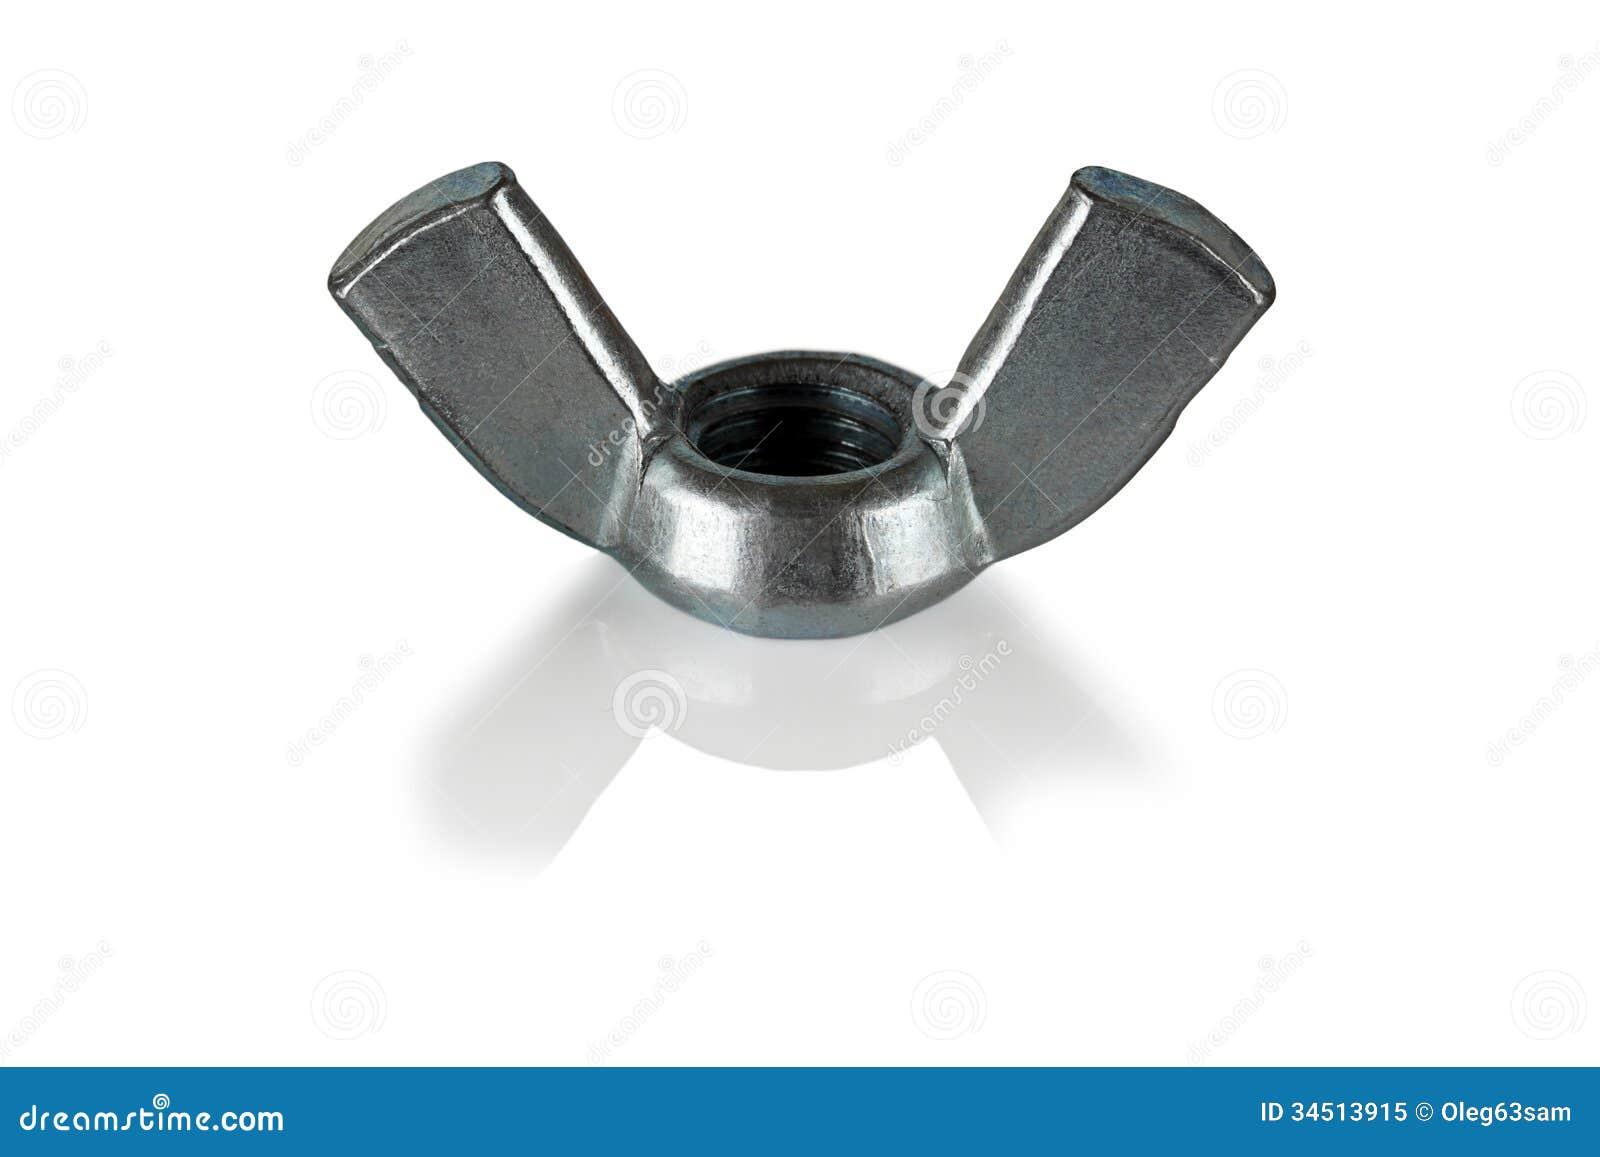 Wing nut stock image of machine reflective